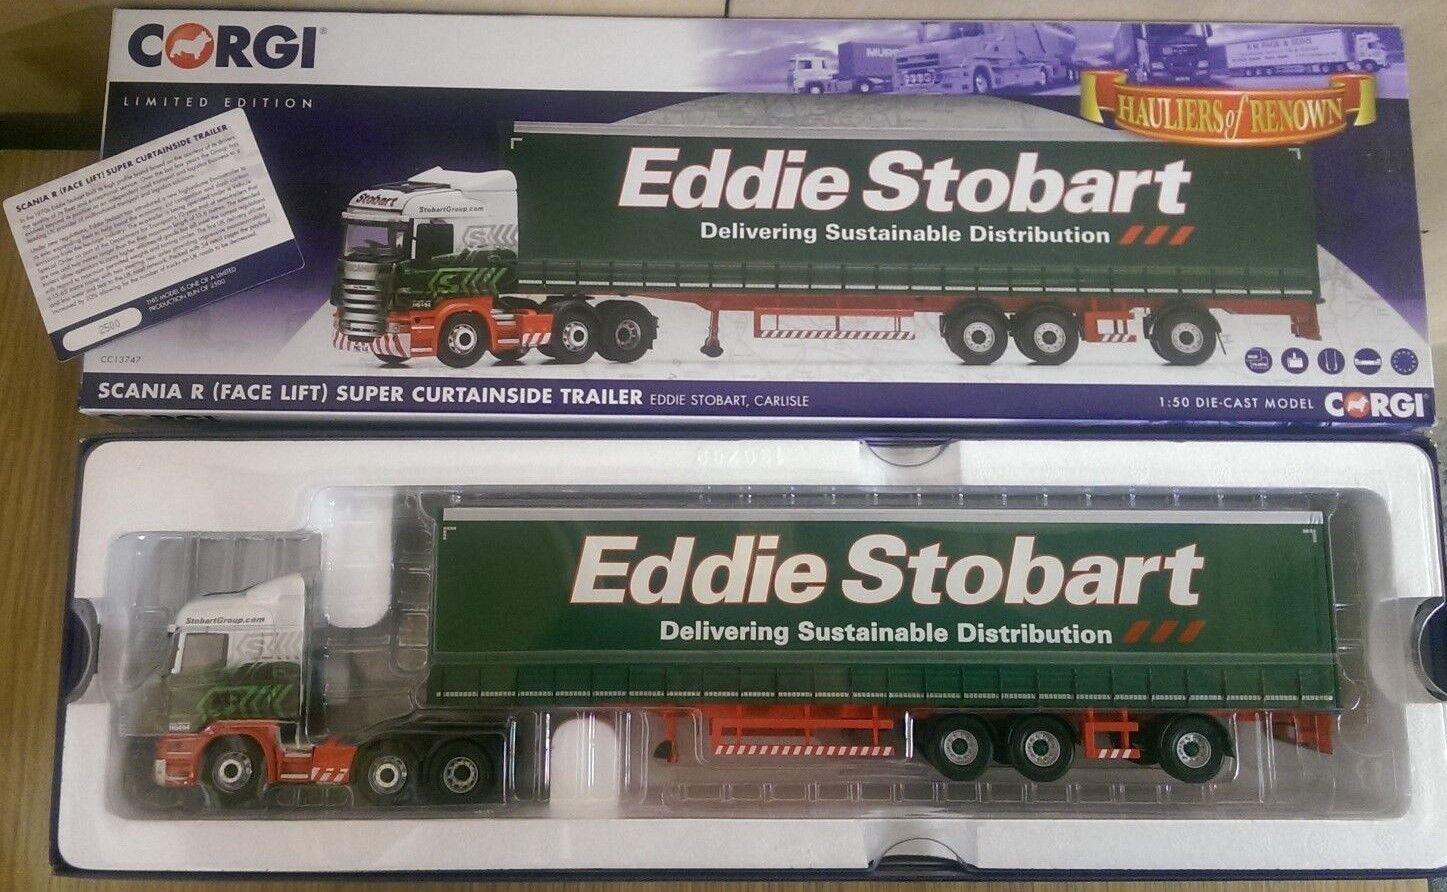 CORGI CC13747 SCANIA R Super Curtainside Eddie Stobart LTD ED Nº 2500 de 2500